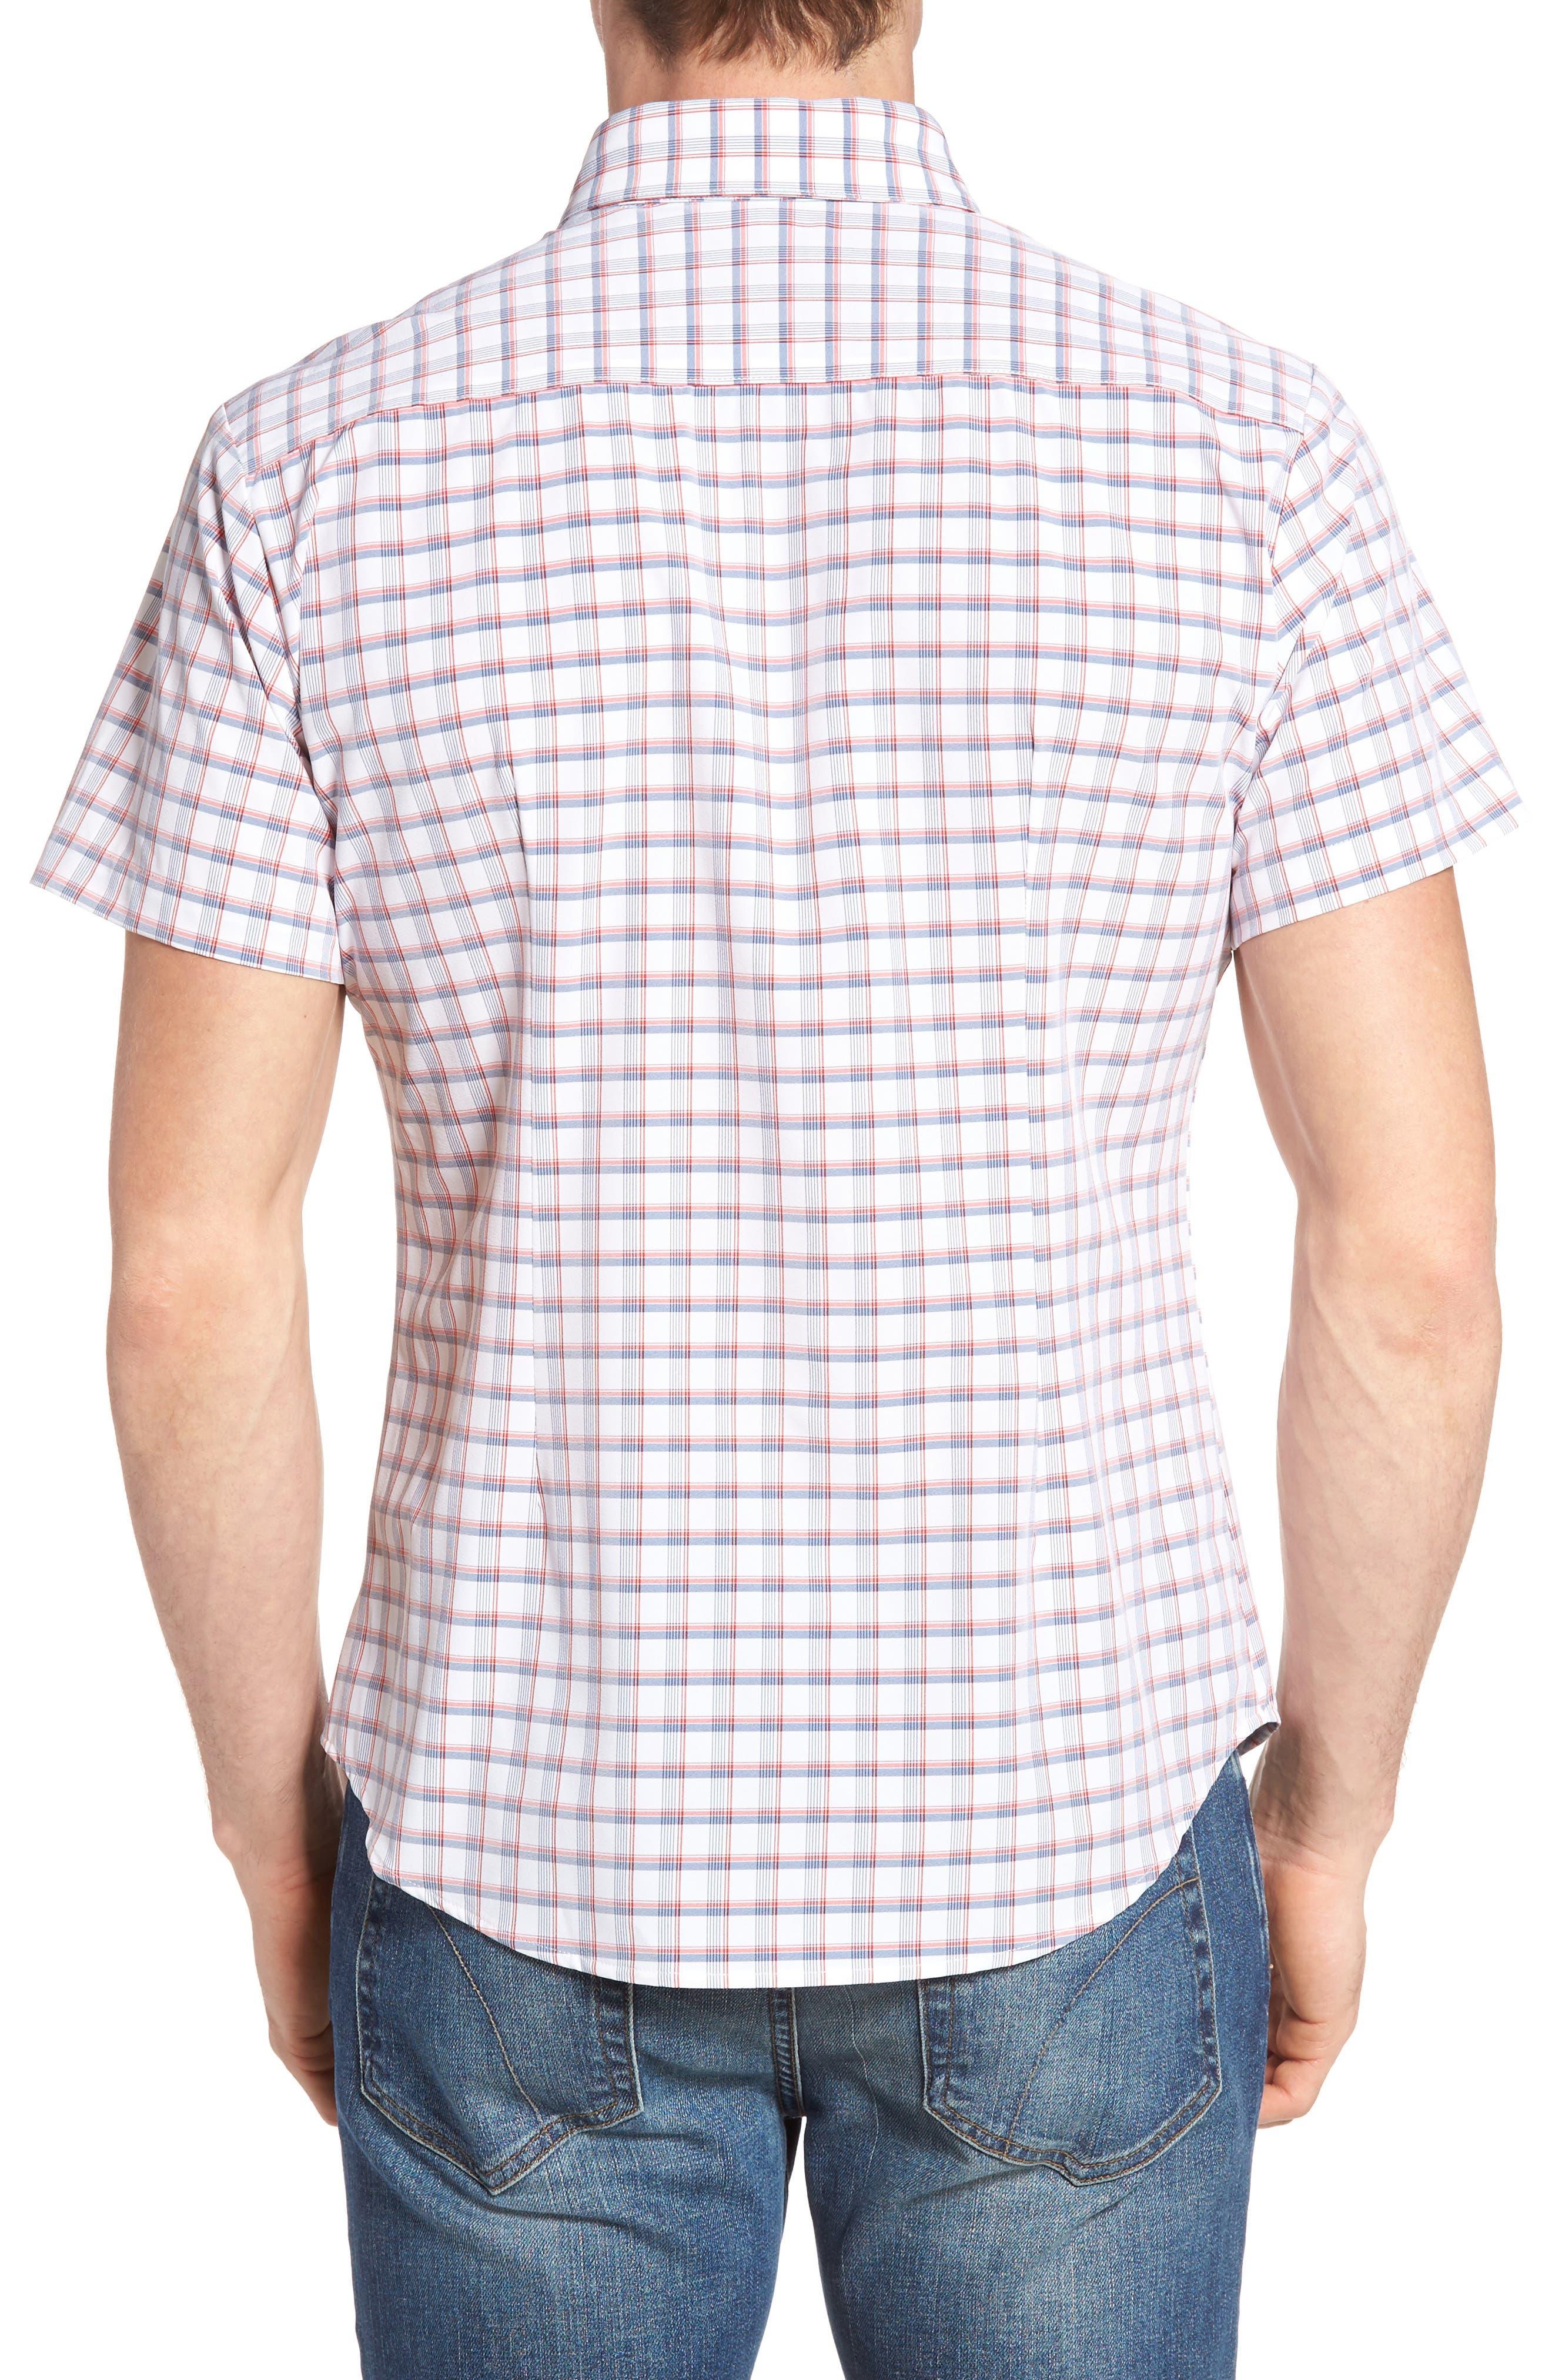 Sanford Slim Fit Plaid Performance Sport Shirt,                             Alternate thumbnail 2, color,                             600